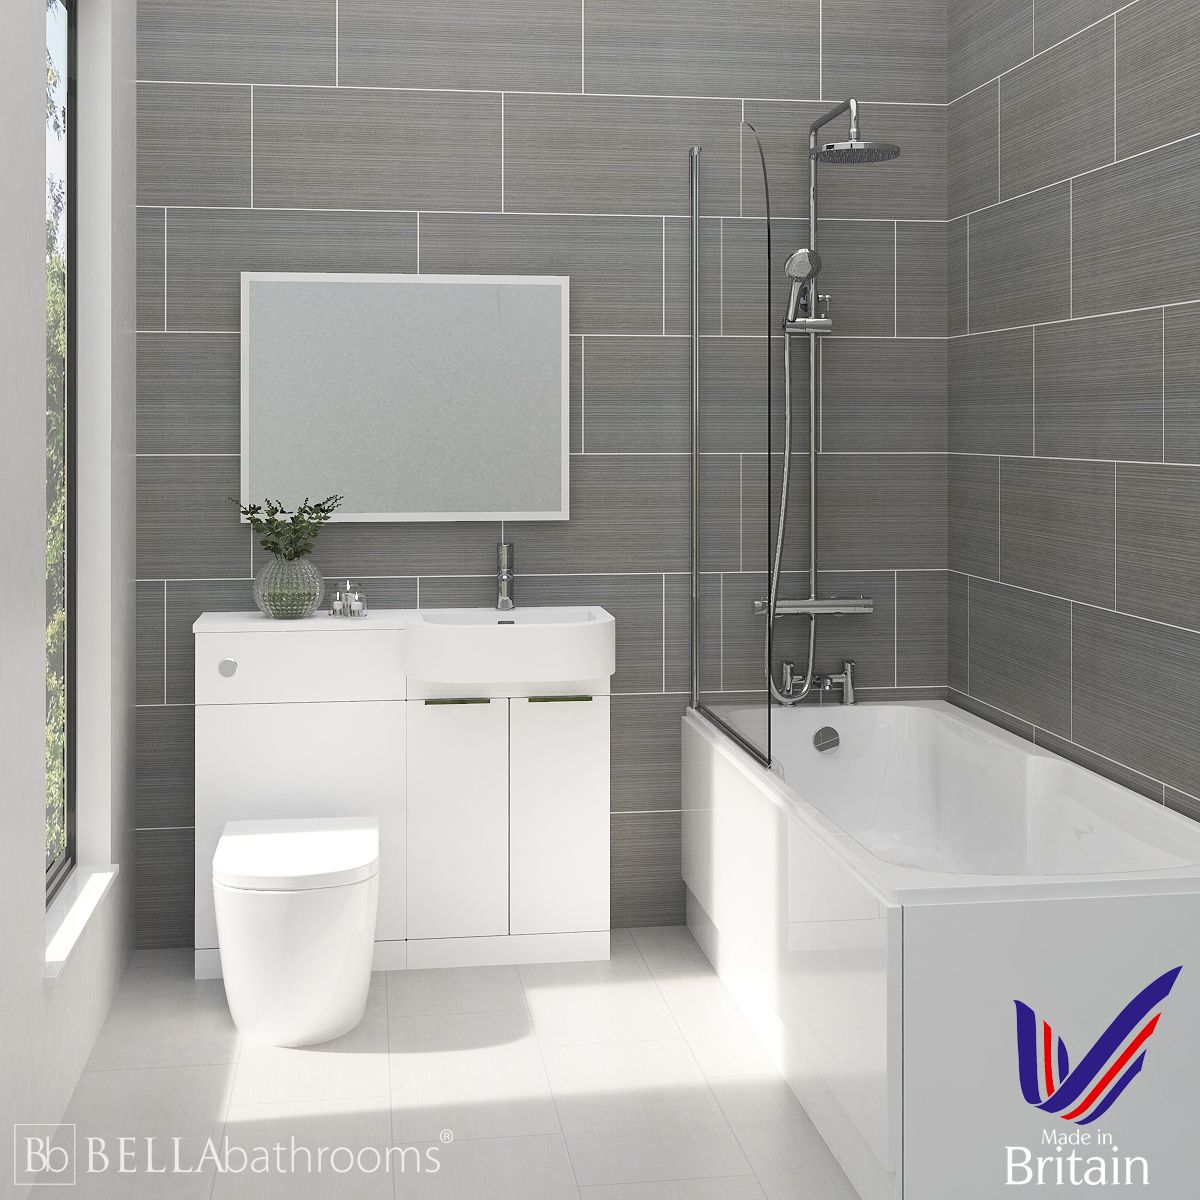 Elation Combination P Shape White Furniture Suite with Nuie Linton Shower Bath